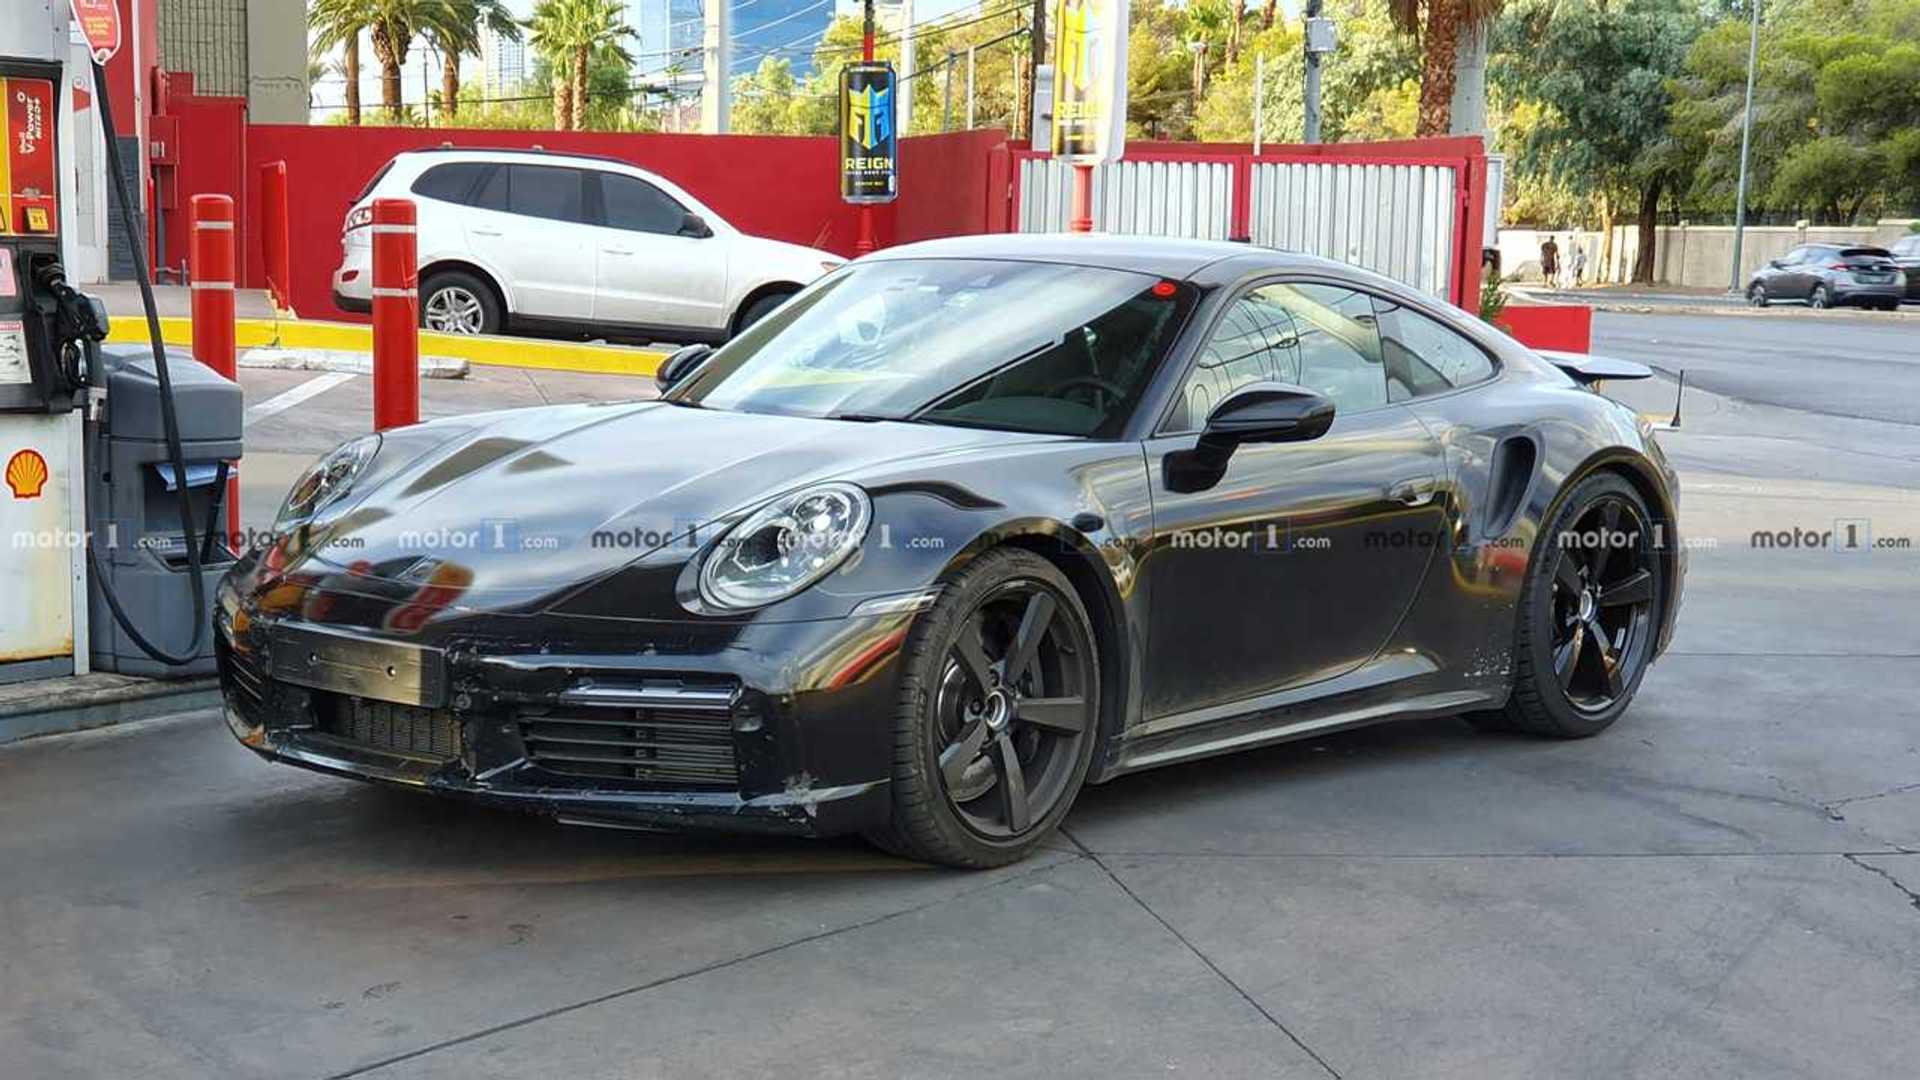 2018 - [Porsche] 911 - Page 16 Porsche-911-turbo-le-foto-spia